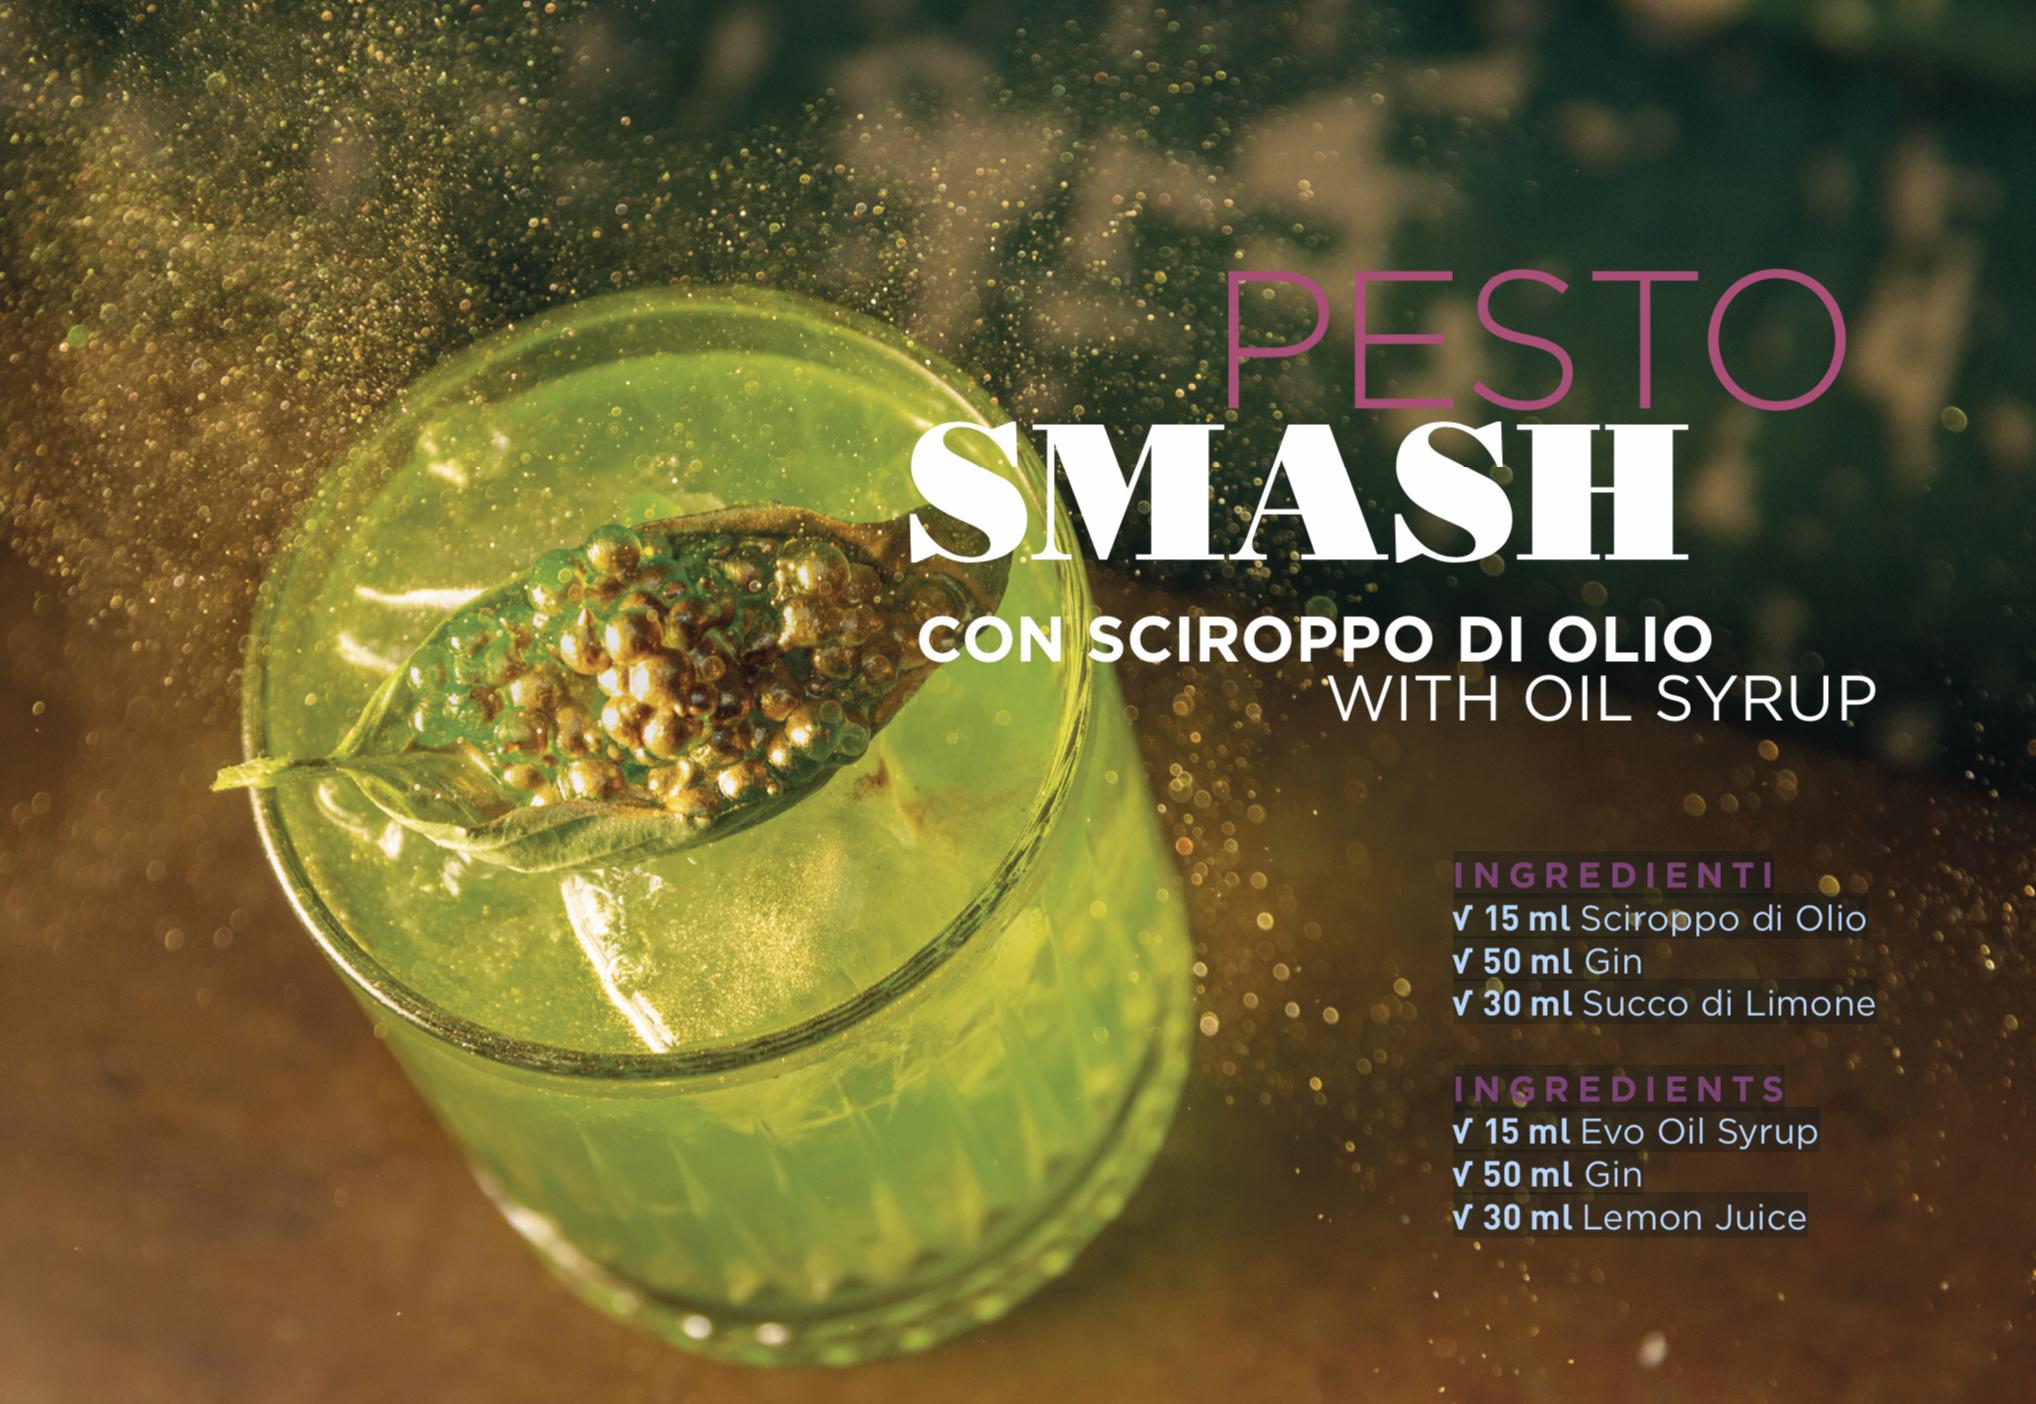 PESTO SMASH WITH OIL SYRUP